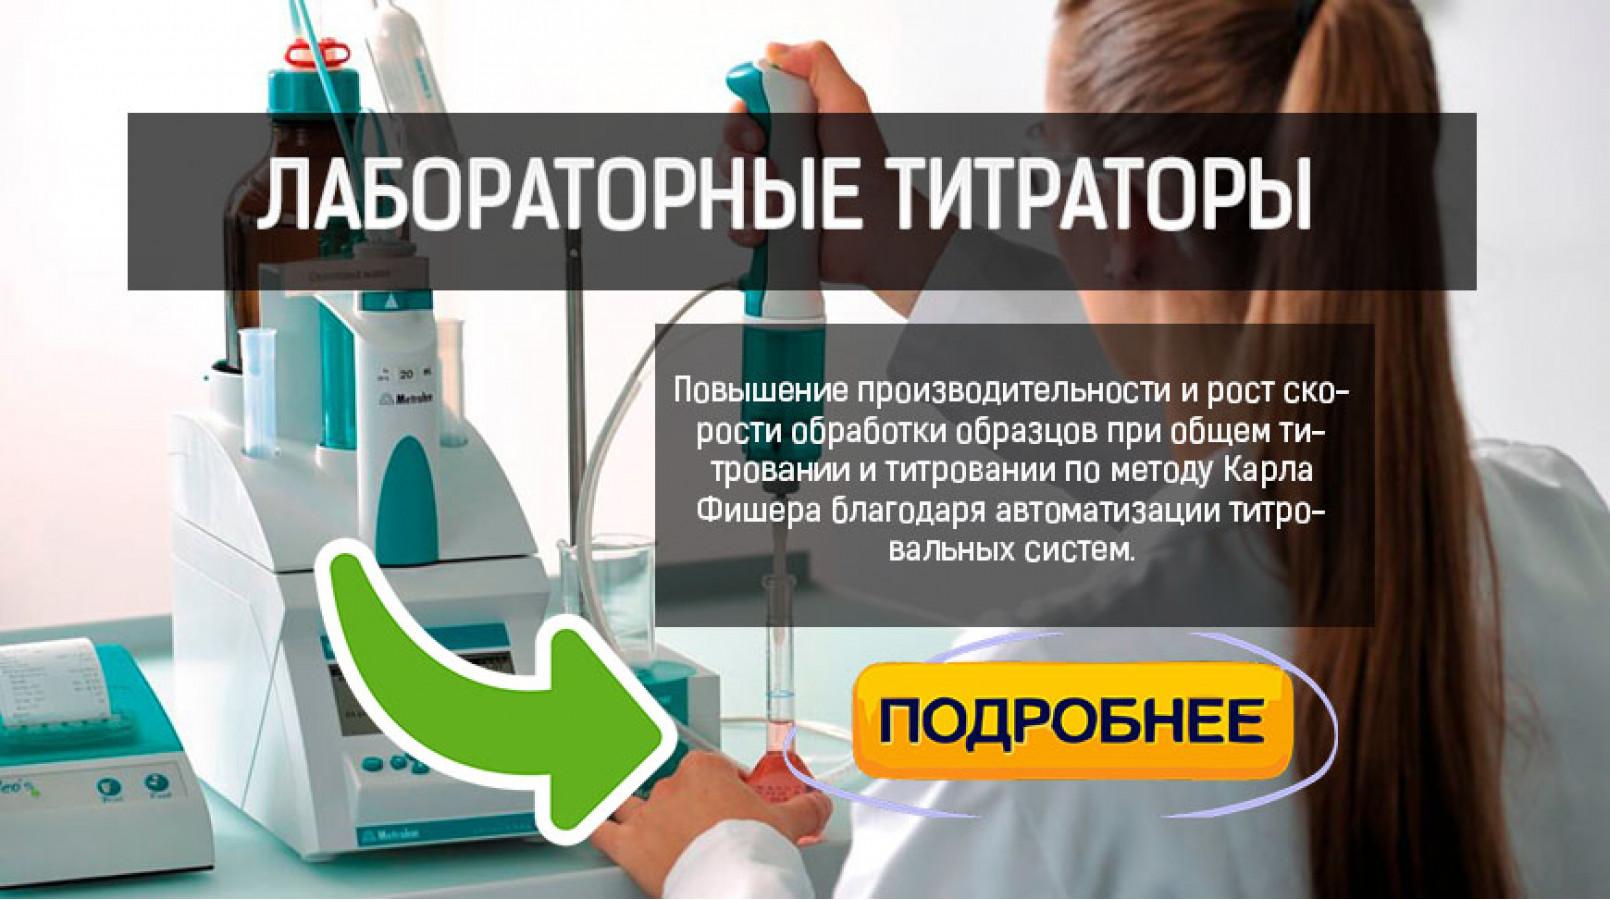 Лабораторные титраторы